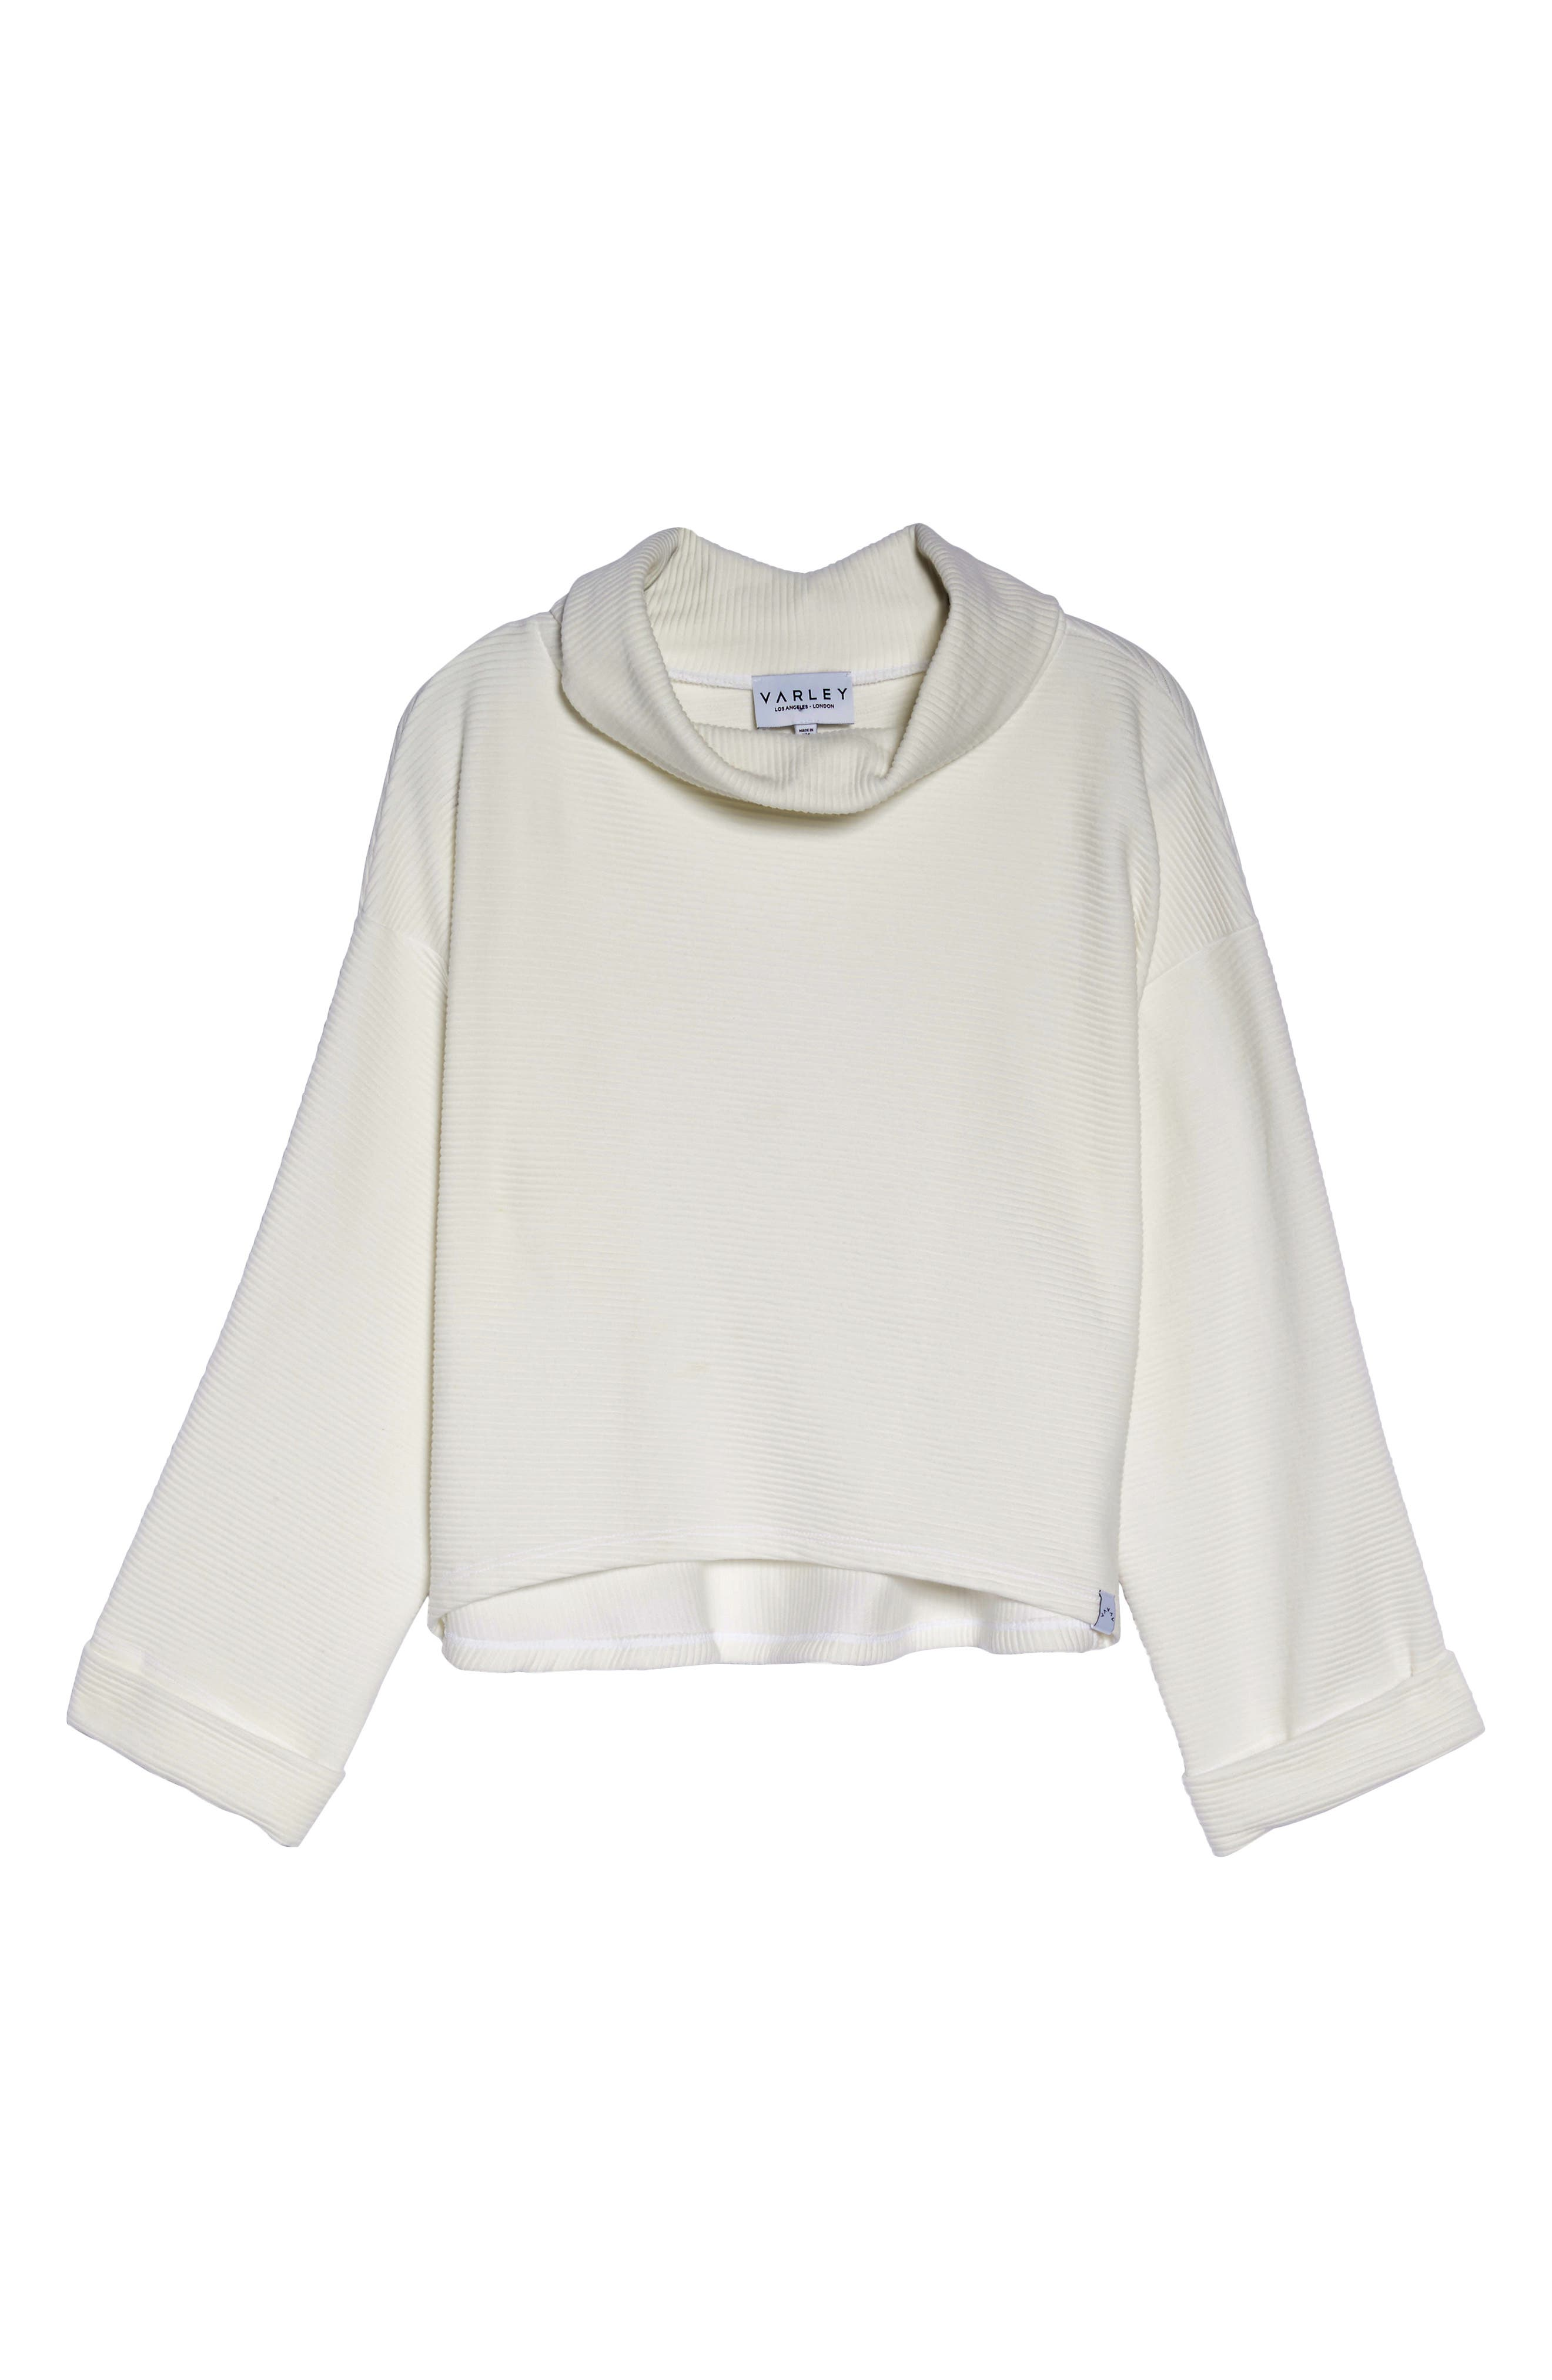 Whittier Sweatshirt,                             Alternate thumbnail 7, color,                             100